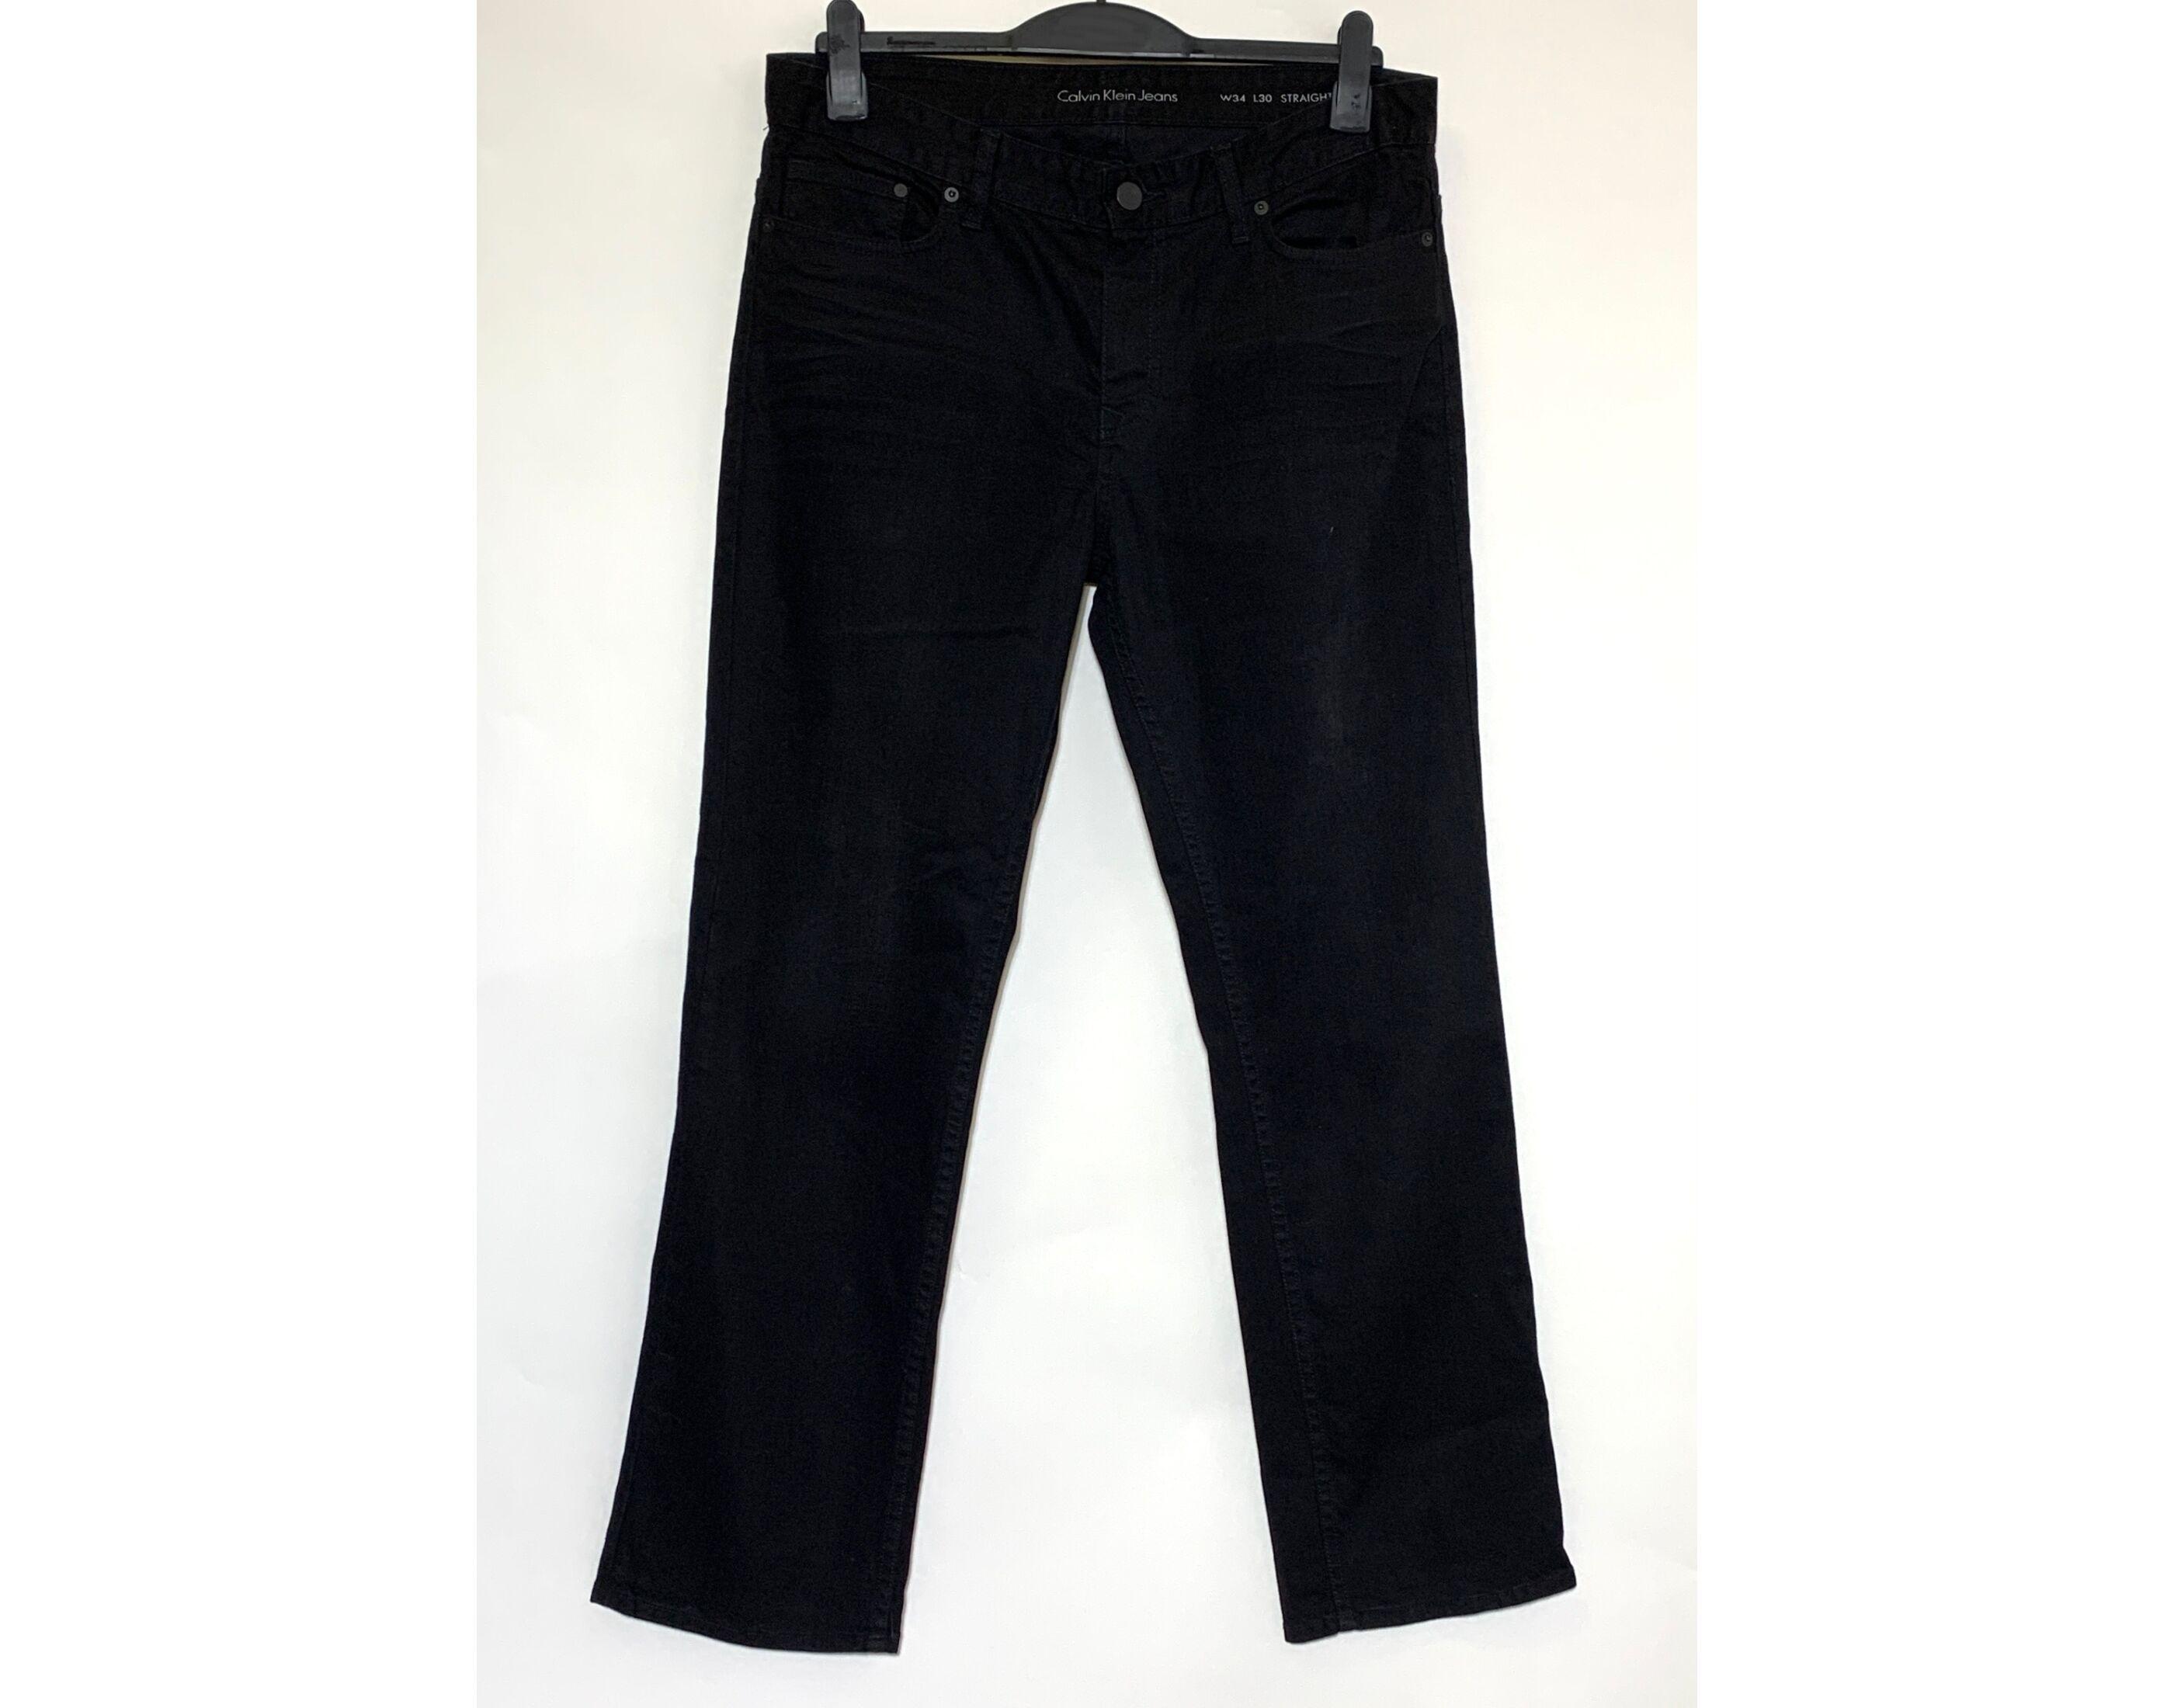 Calvin Klein Jeans nadrág (34/30)